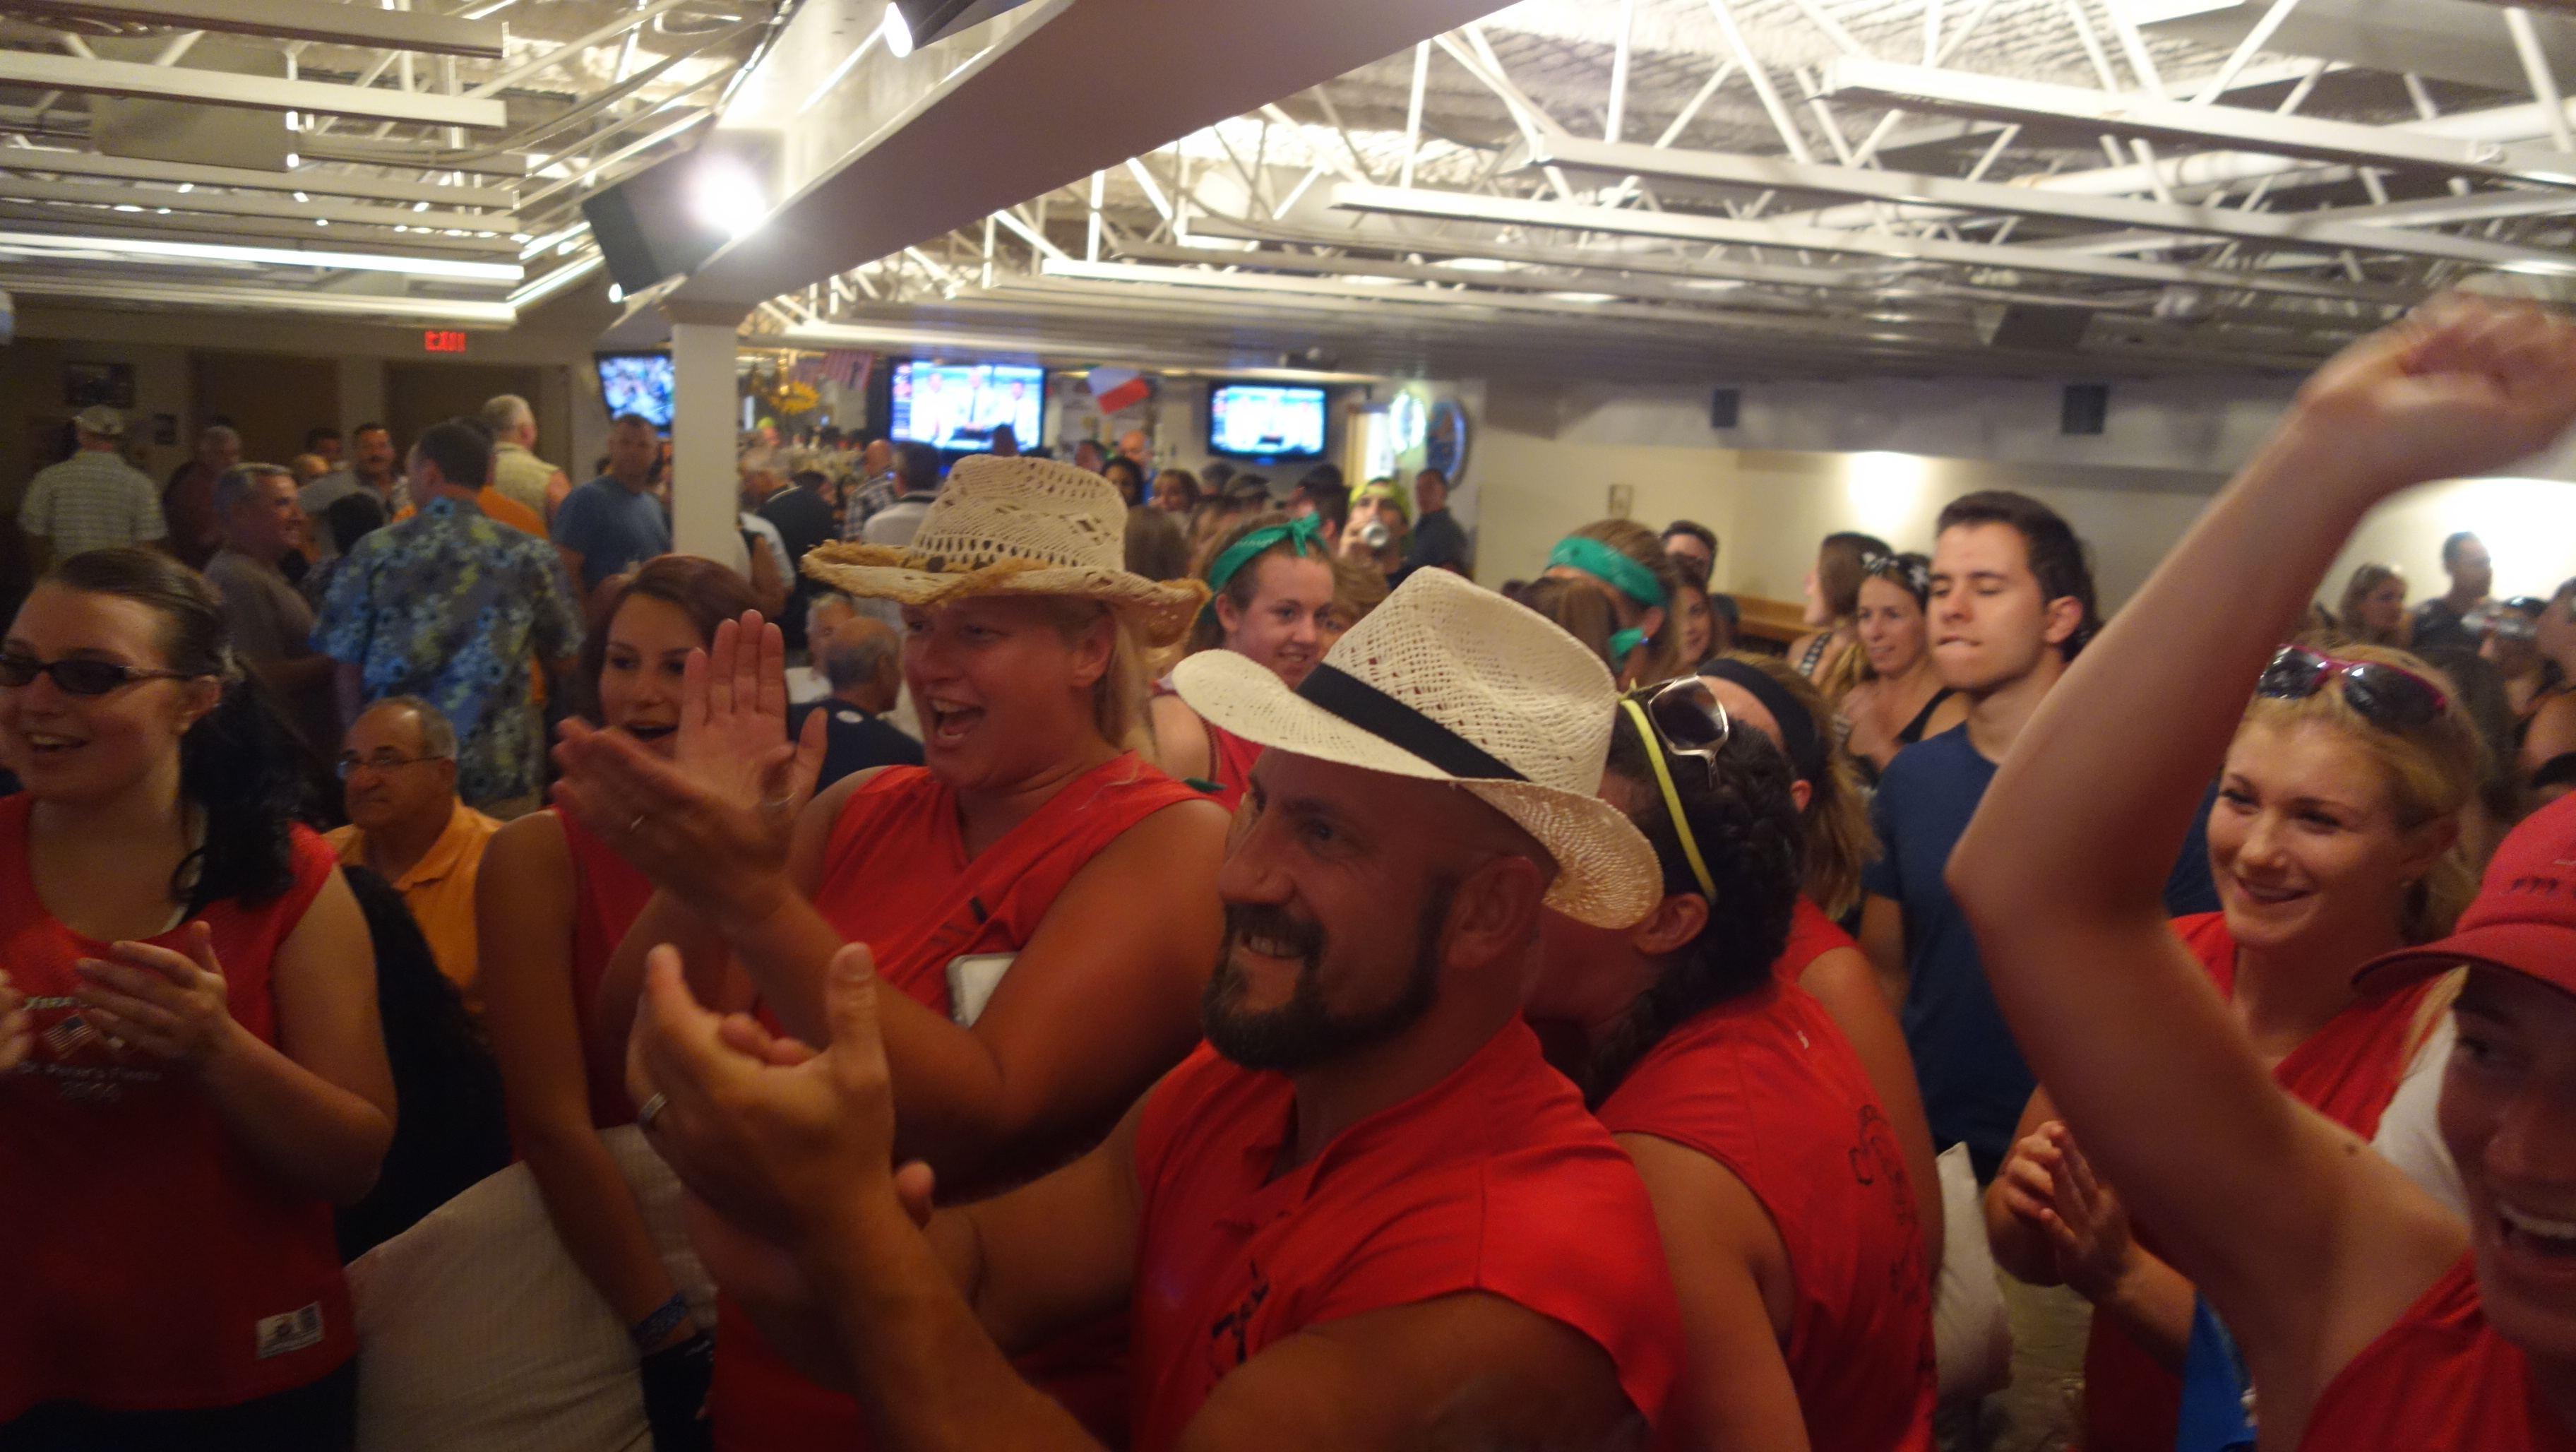 Amanda Race St. Peter's Fiesta 2014 Camps! 404